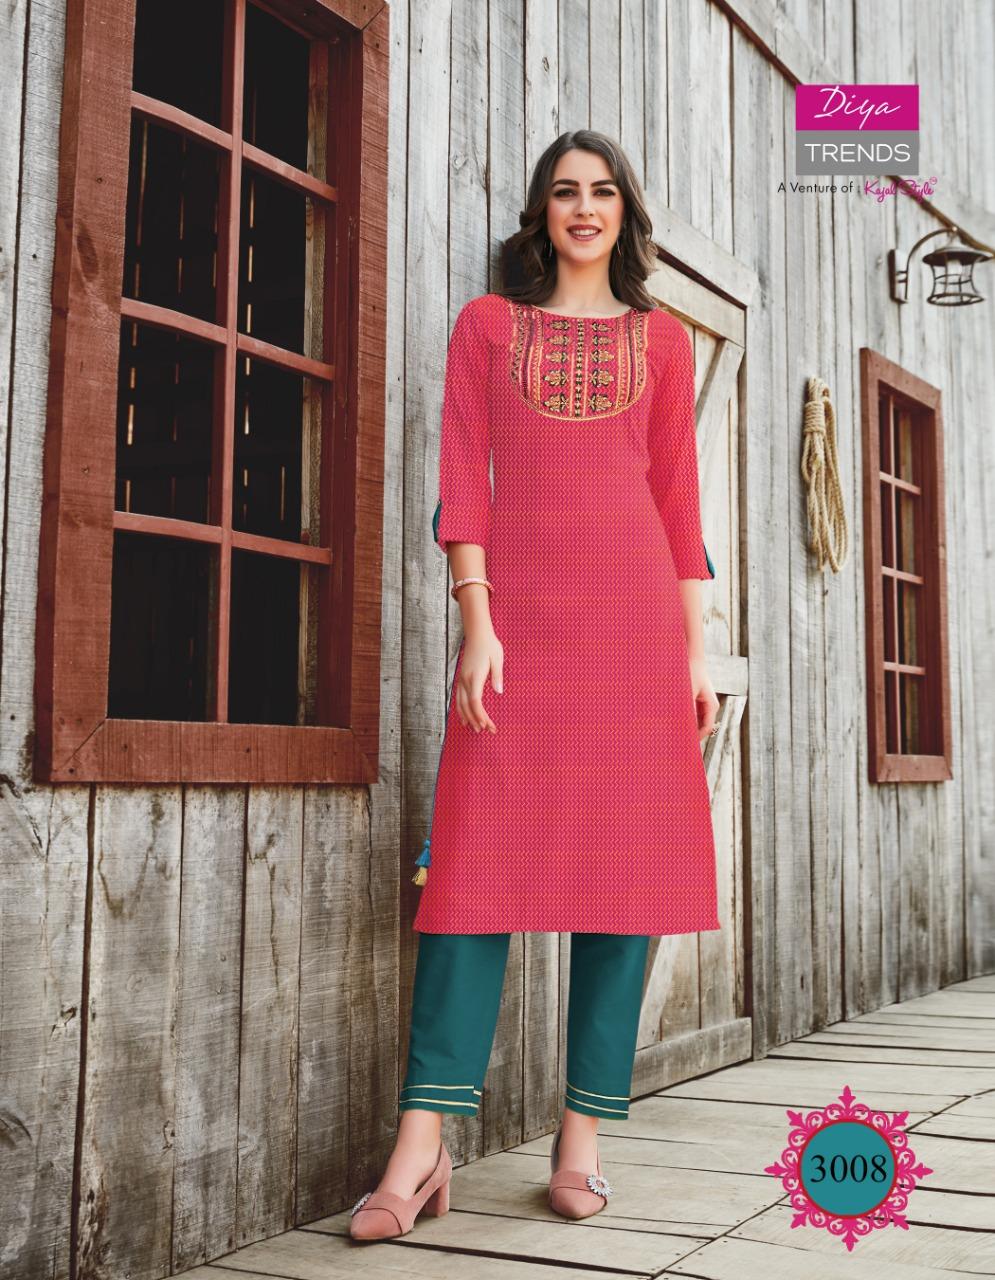 Diya Trends Victoria Vol 3 by Kajal Style Kurti Wholesale Catalog 12 Pcs 12 - Diya Trends Victoria Vol 3 by Kajal Style Kurti Wholesale Catalog 12 Pcs